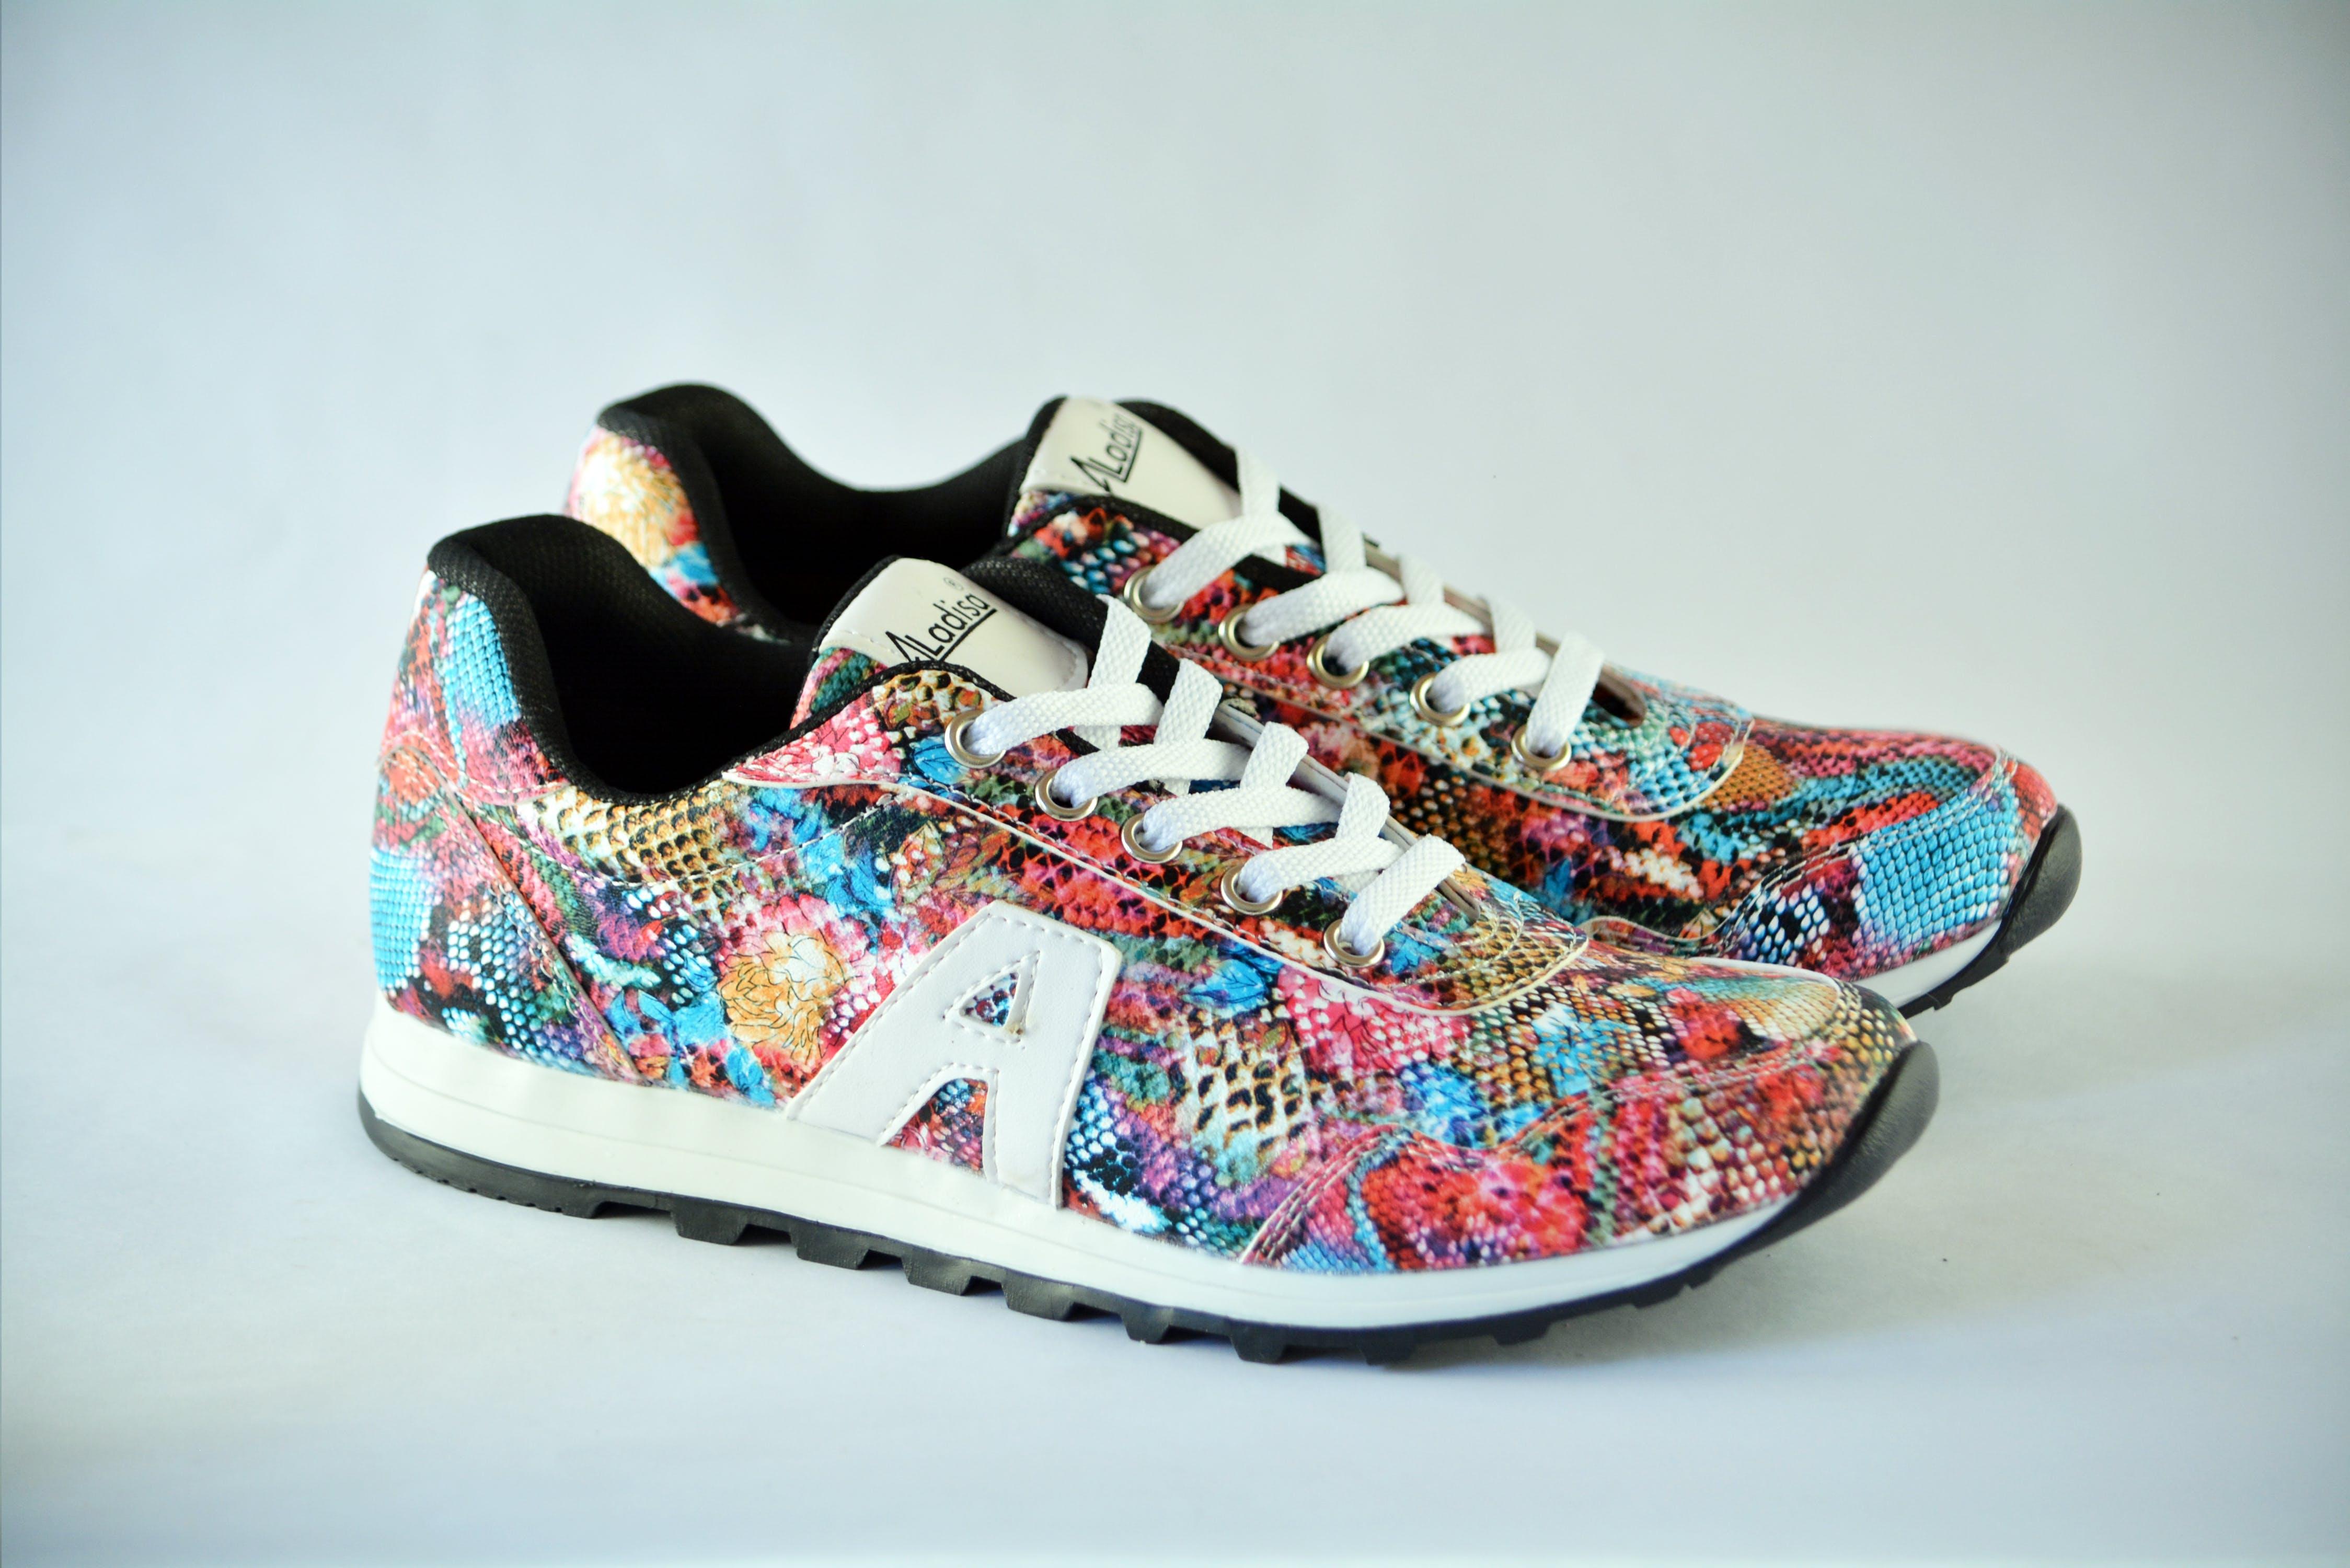 Pair of Multicolored Low-top Sneakers